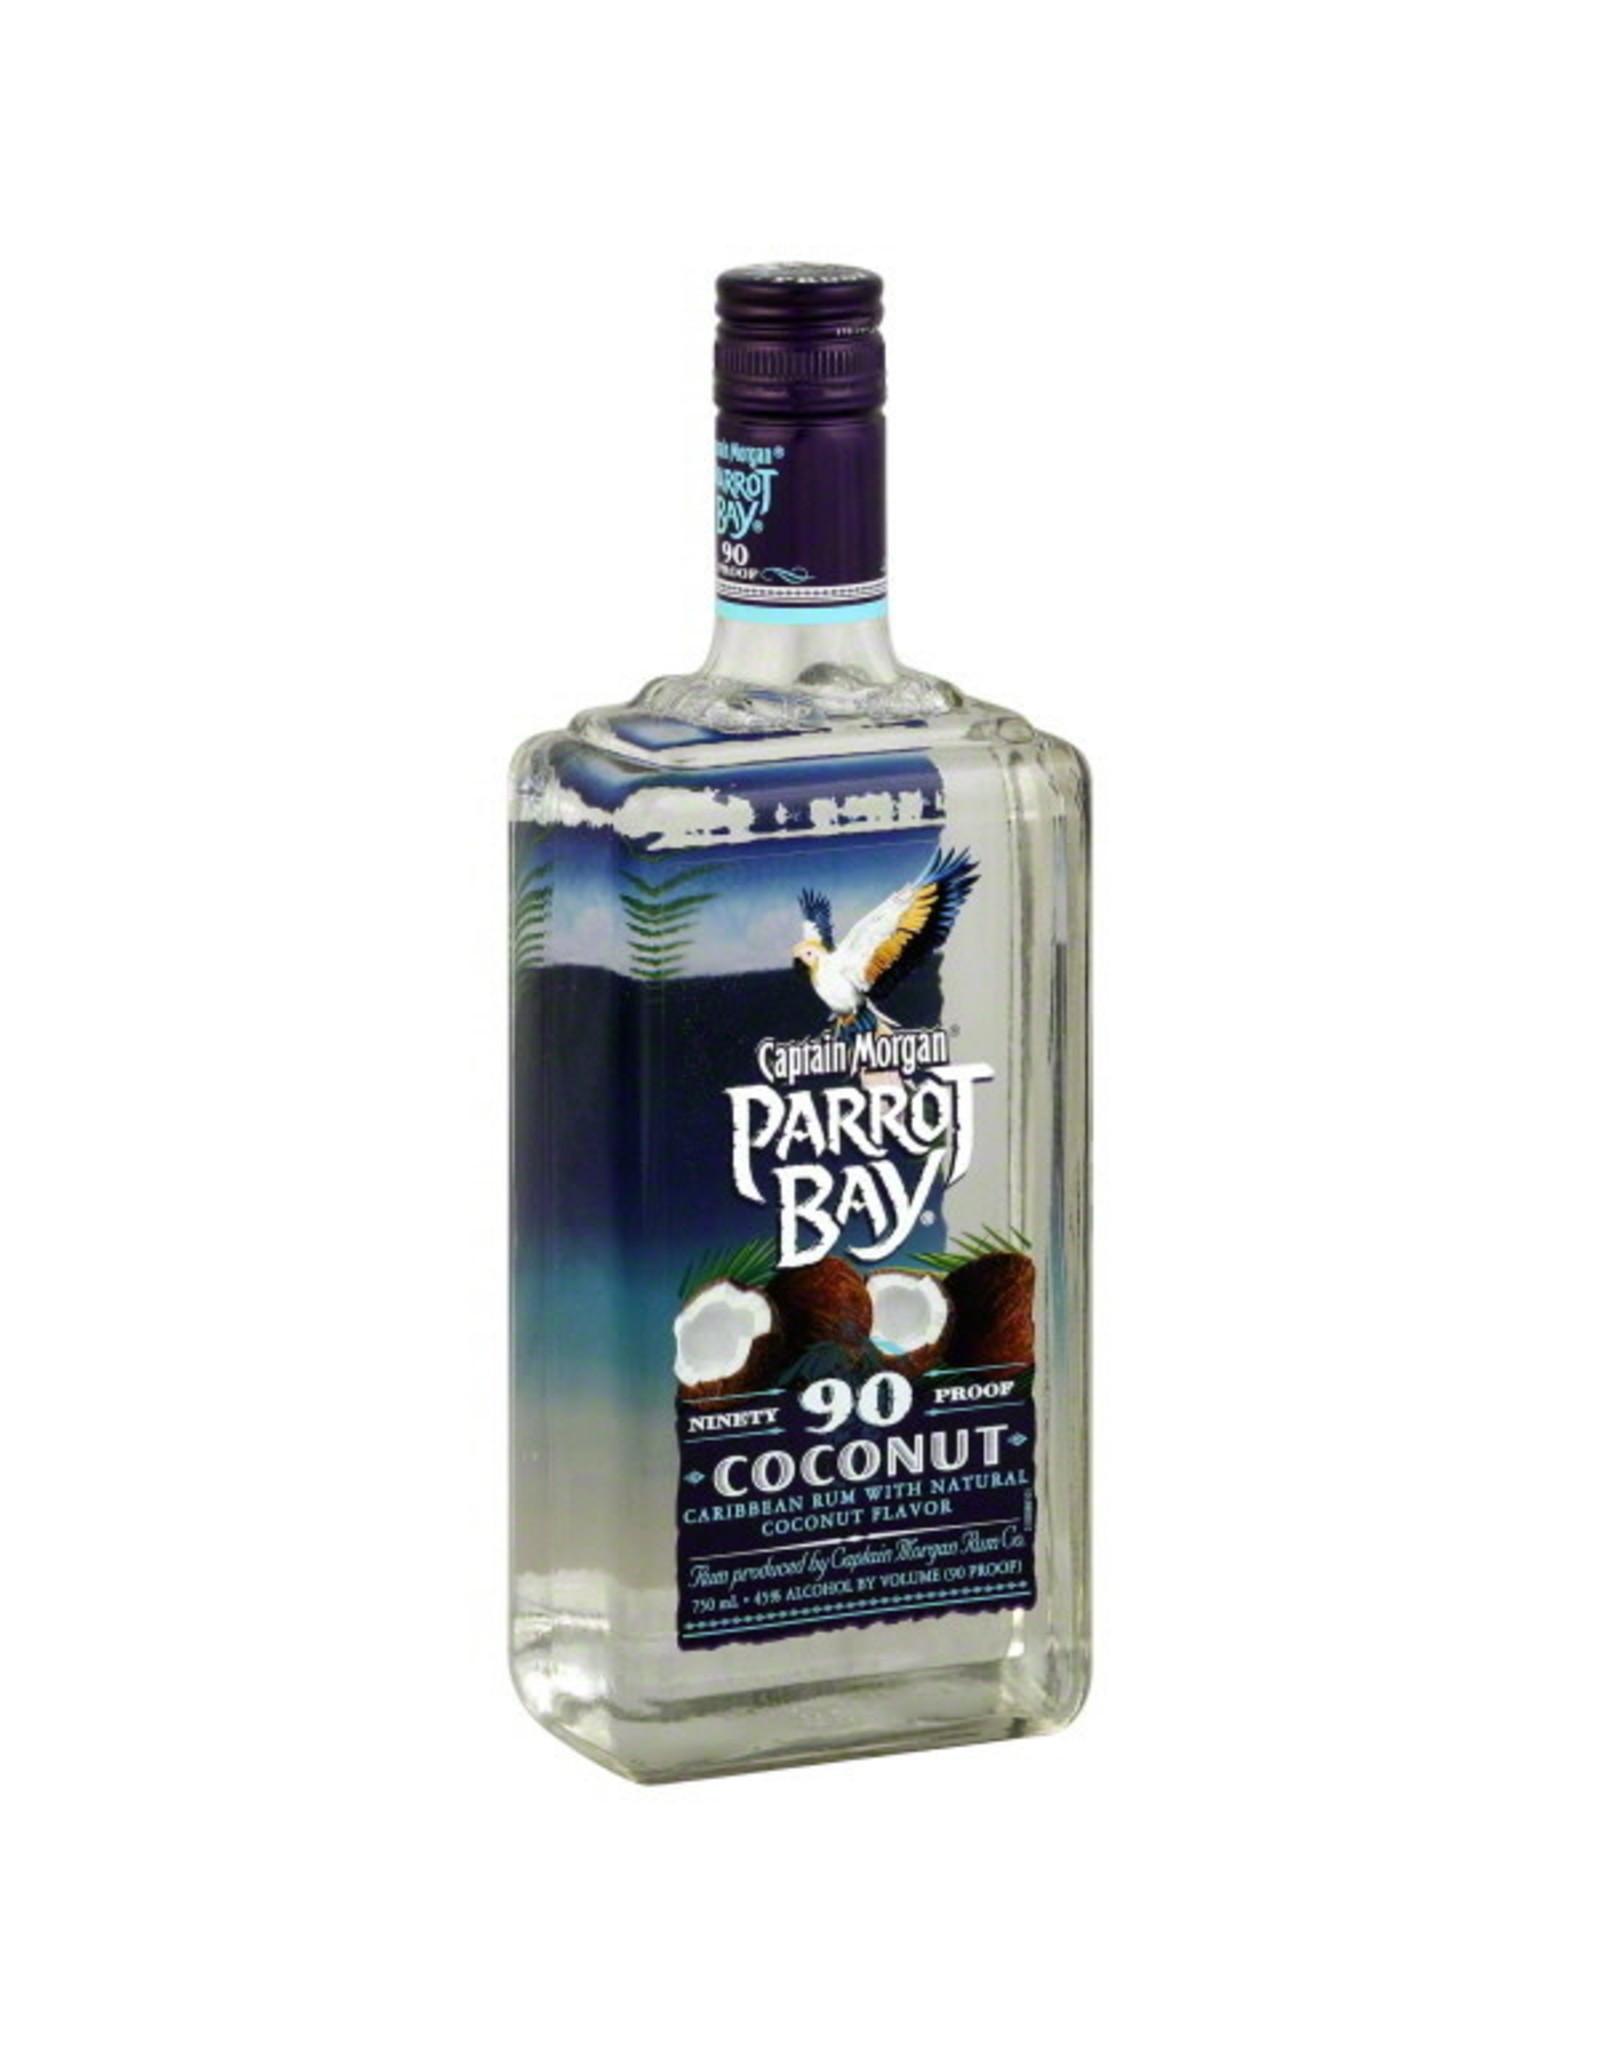 PARROT BAY COCONUT 90 1.75L